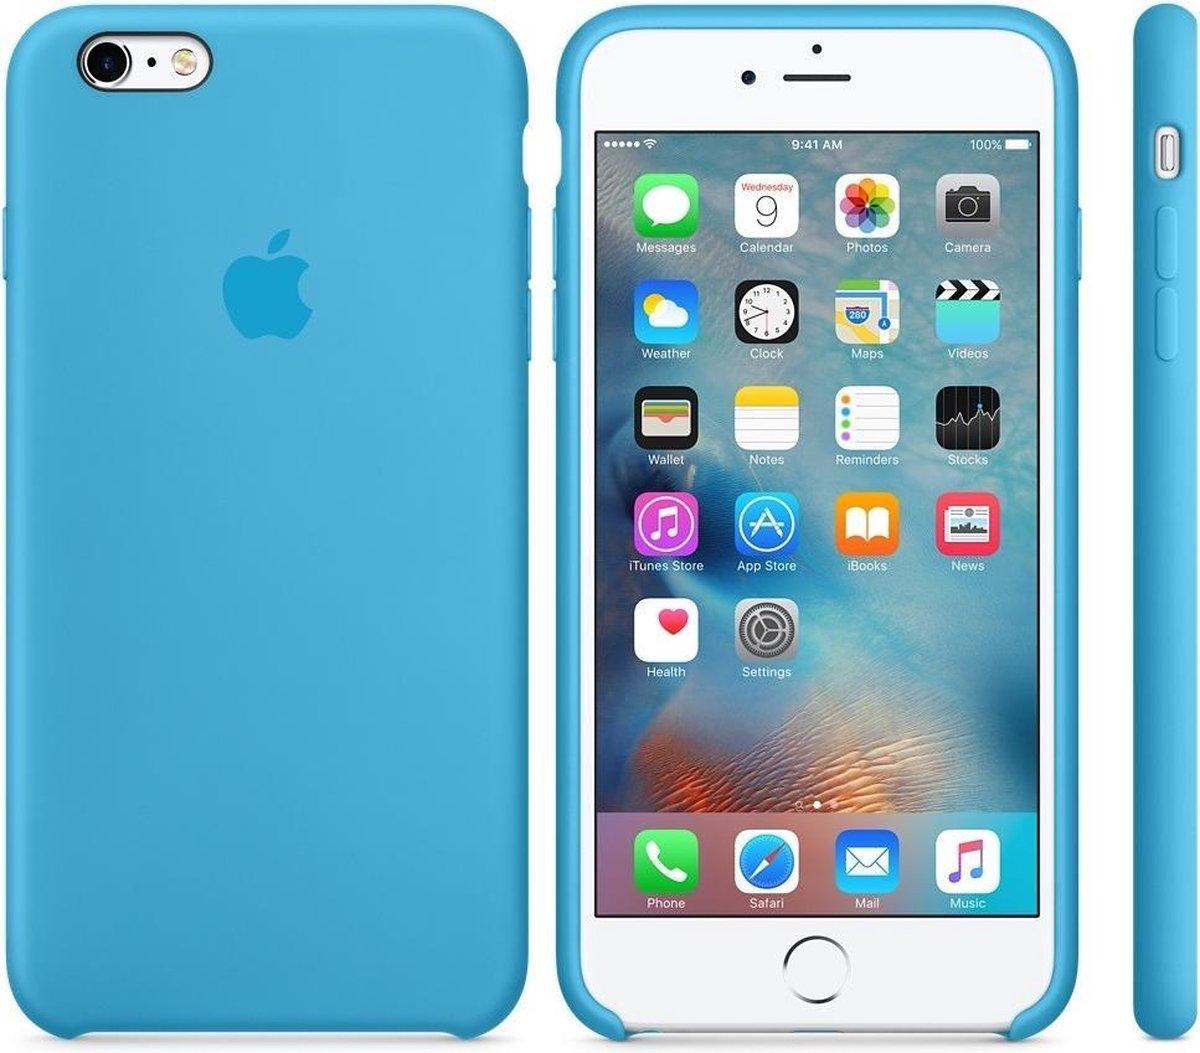 Apple Siliconen Back Cover voor iPhone 6Plus / iPhone 6s Plus - Blauw